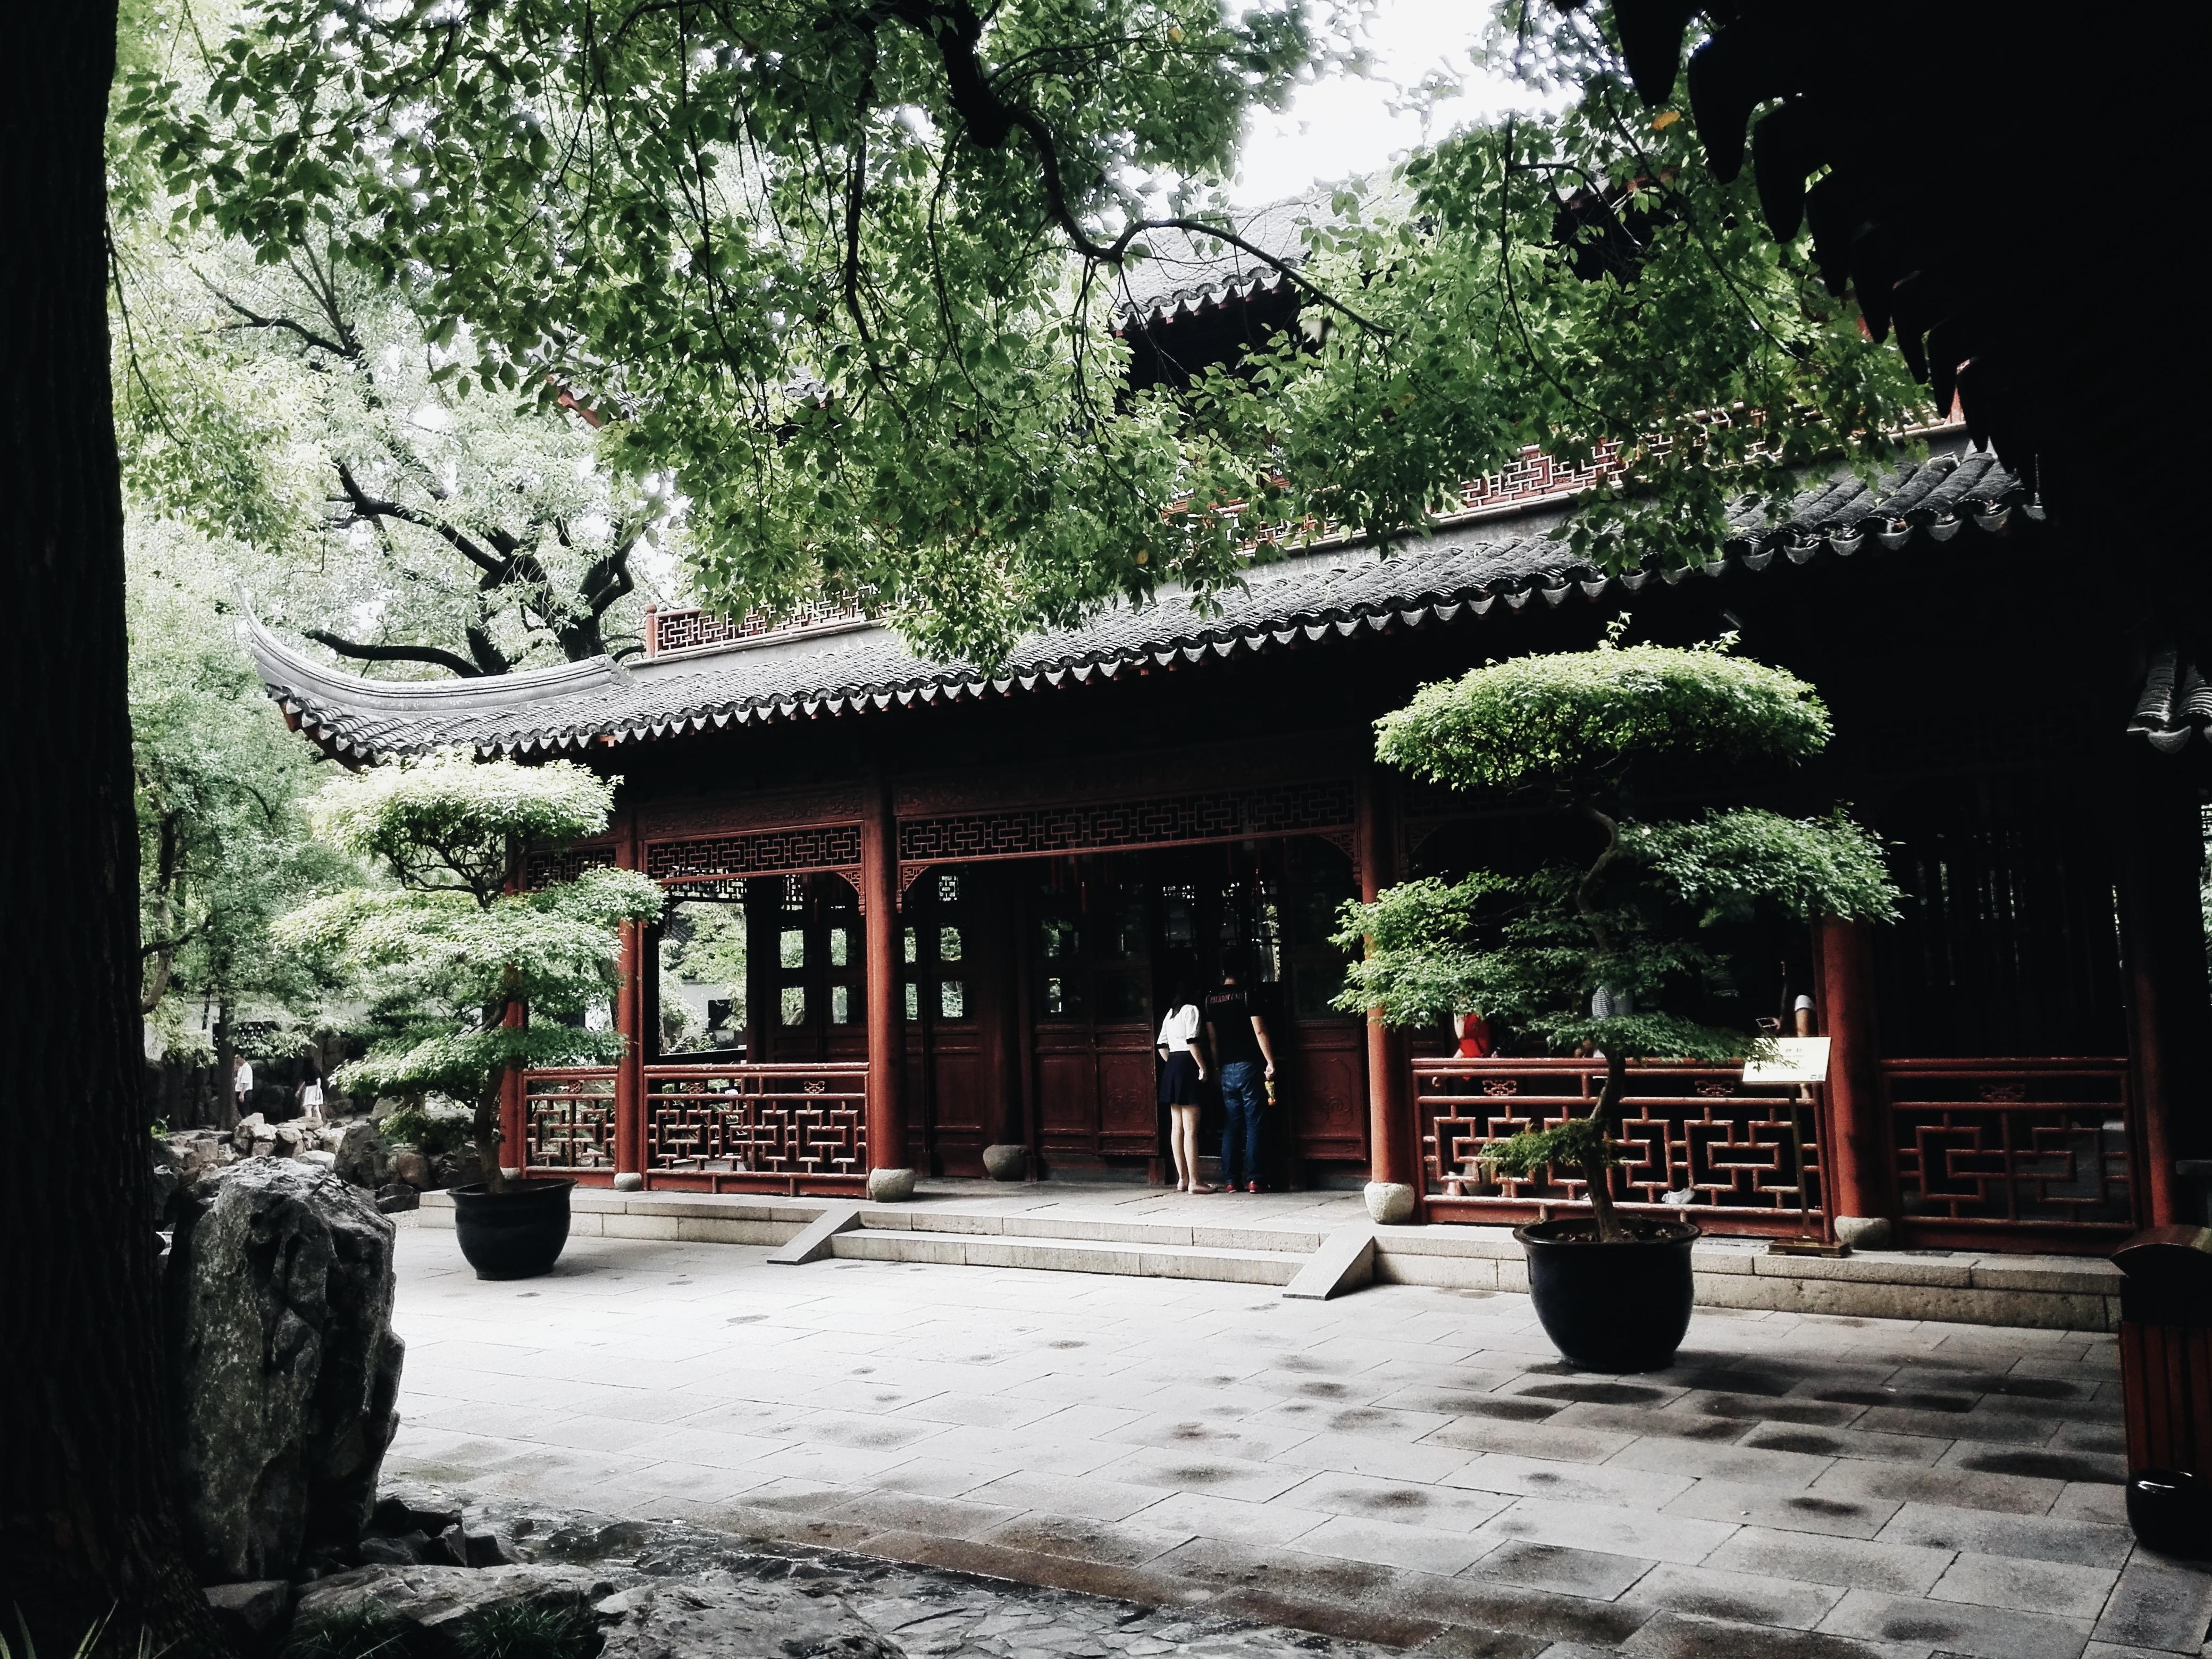 Yu Garden 豫园